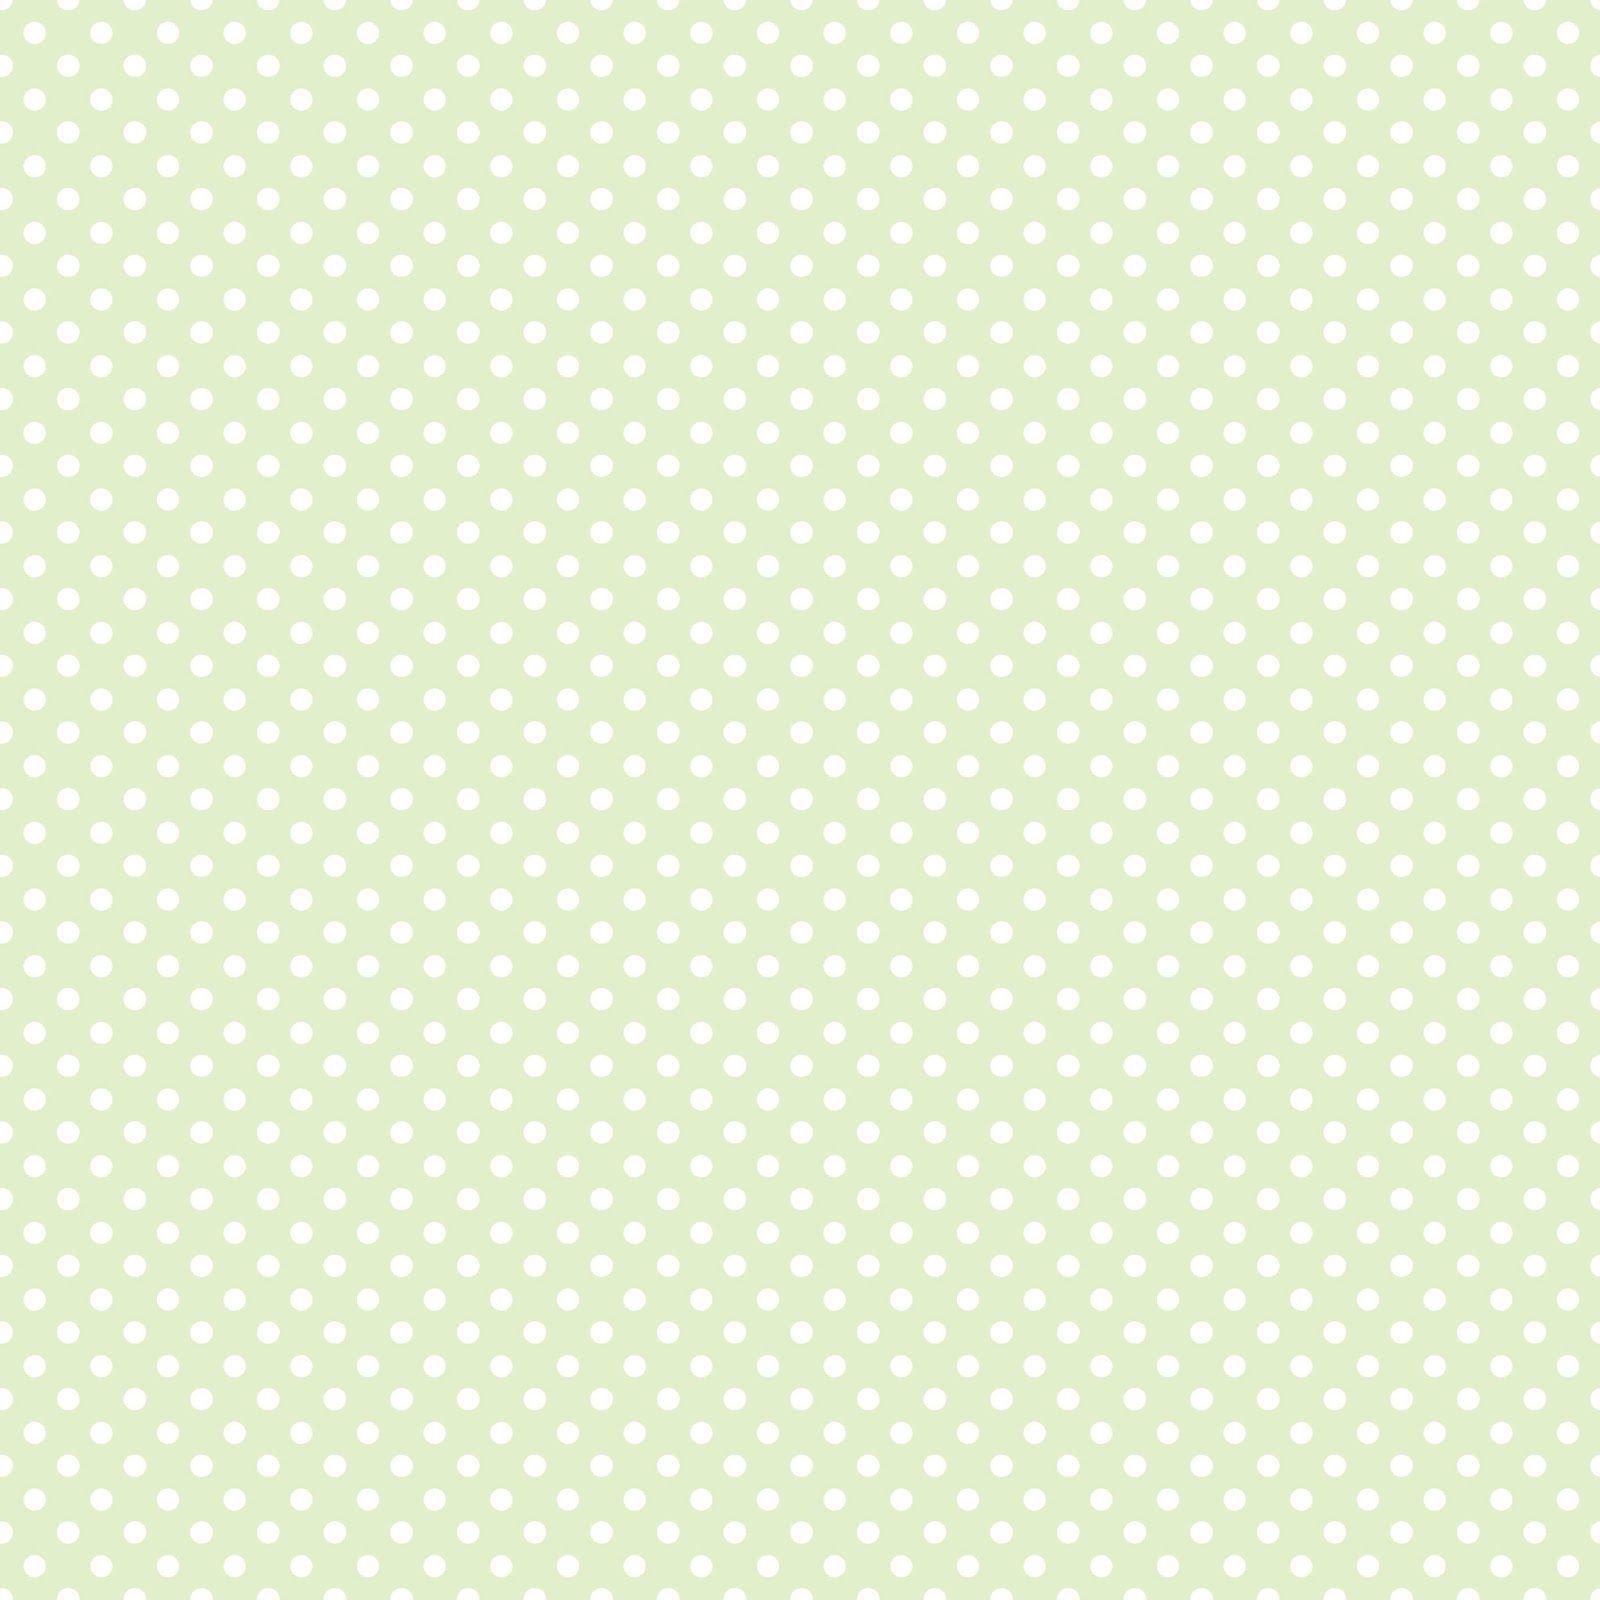 28 Elegant Image of Scrapbook Backgrounds Printables Scrapbook 1600x1600